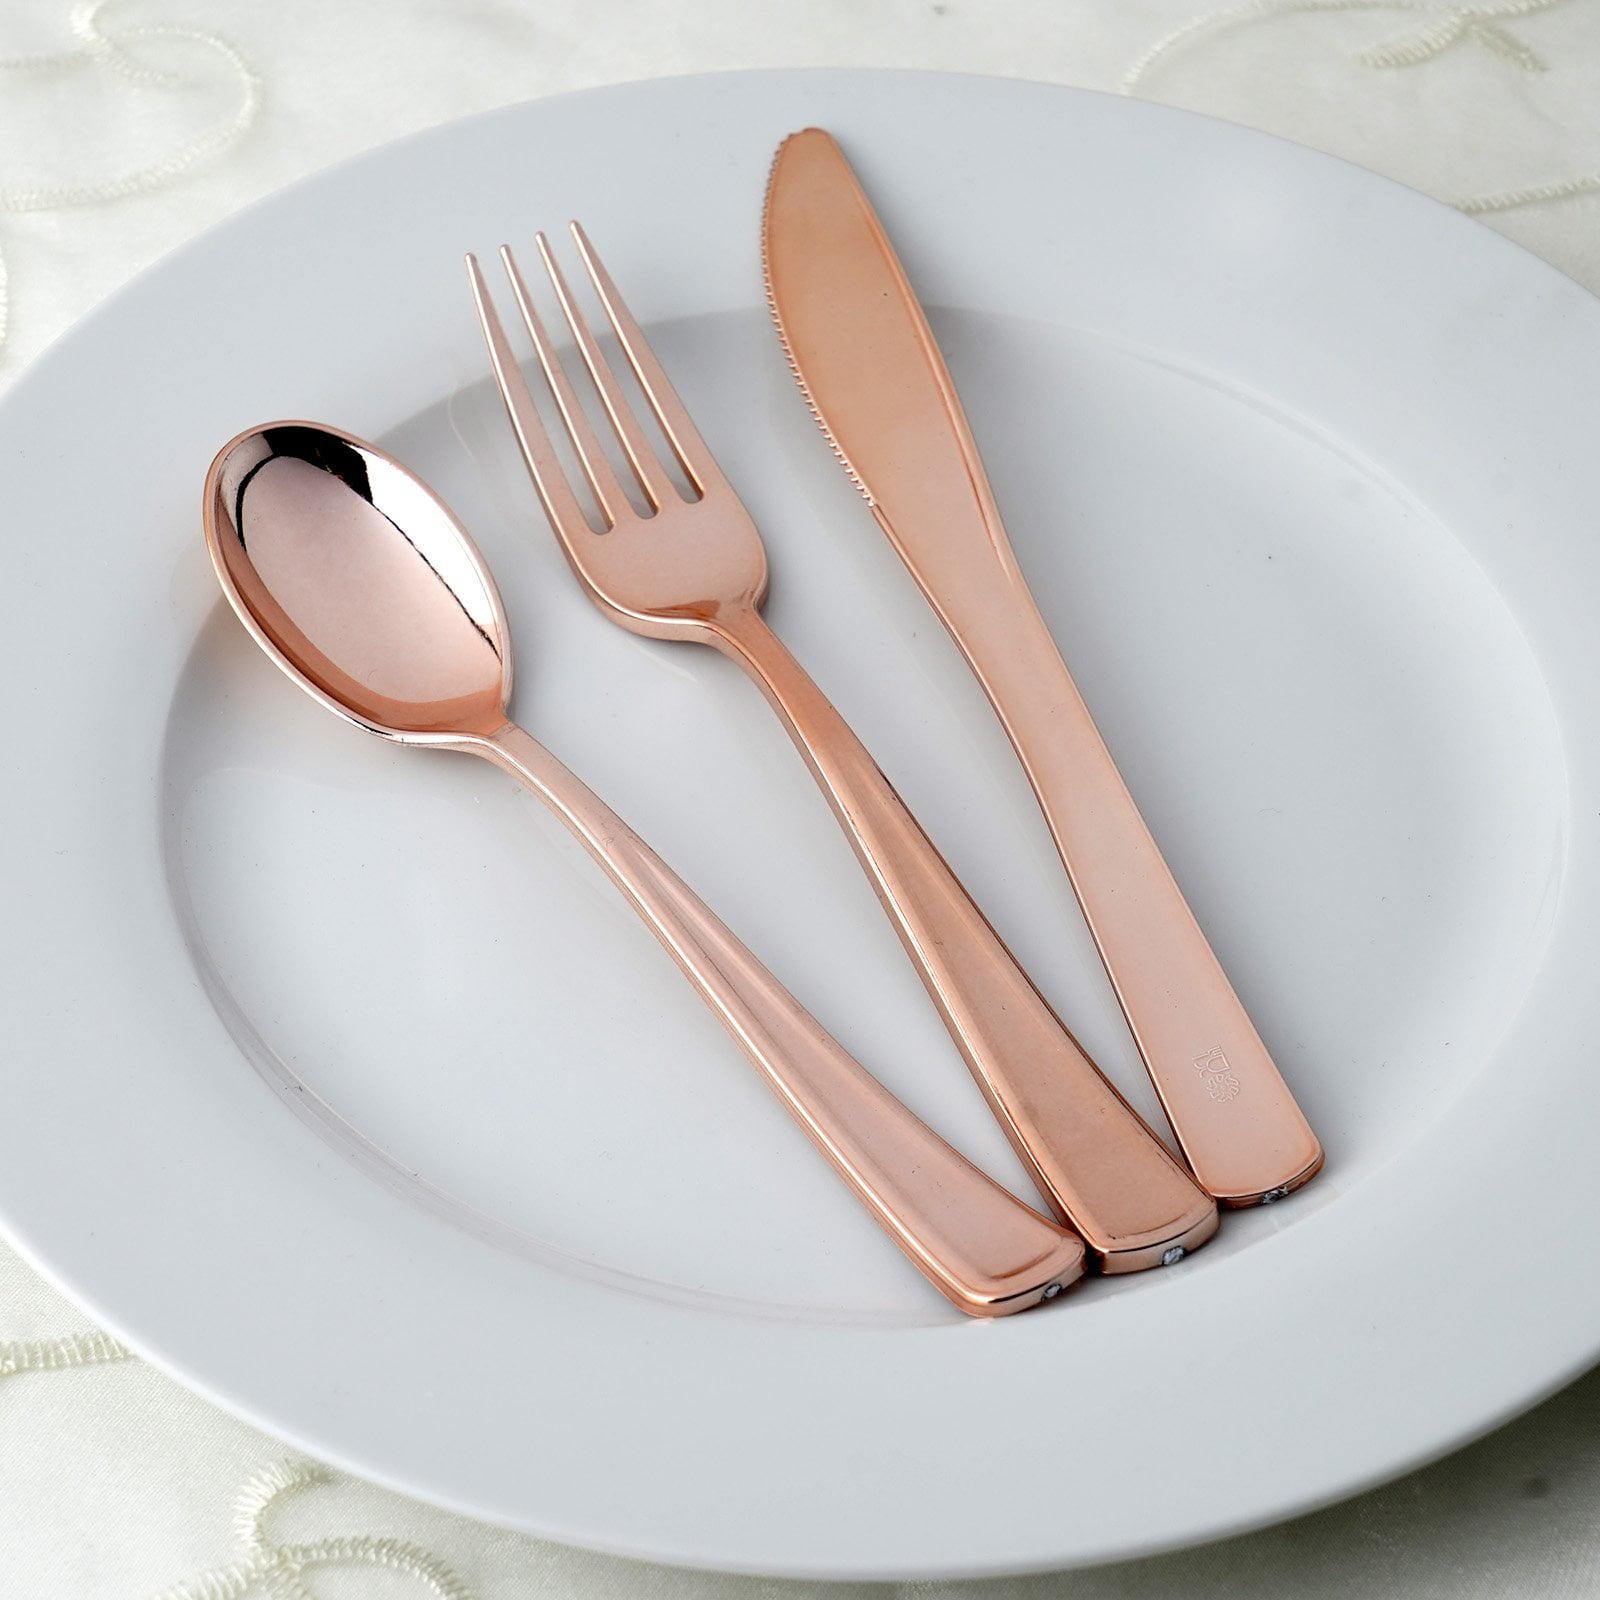 BalsaCircle Metallic Rose Gold 30 pcs Spoons, Forks, and Knives Disposable Silverware Wedding Reception Party... by BalsaCircle